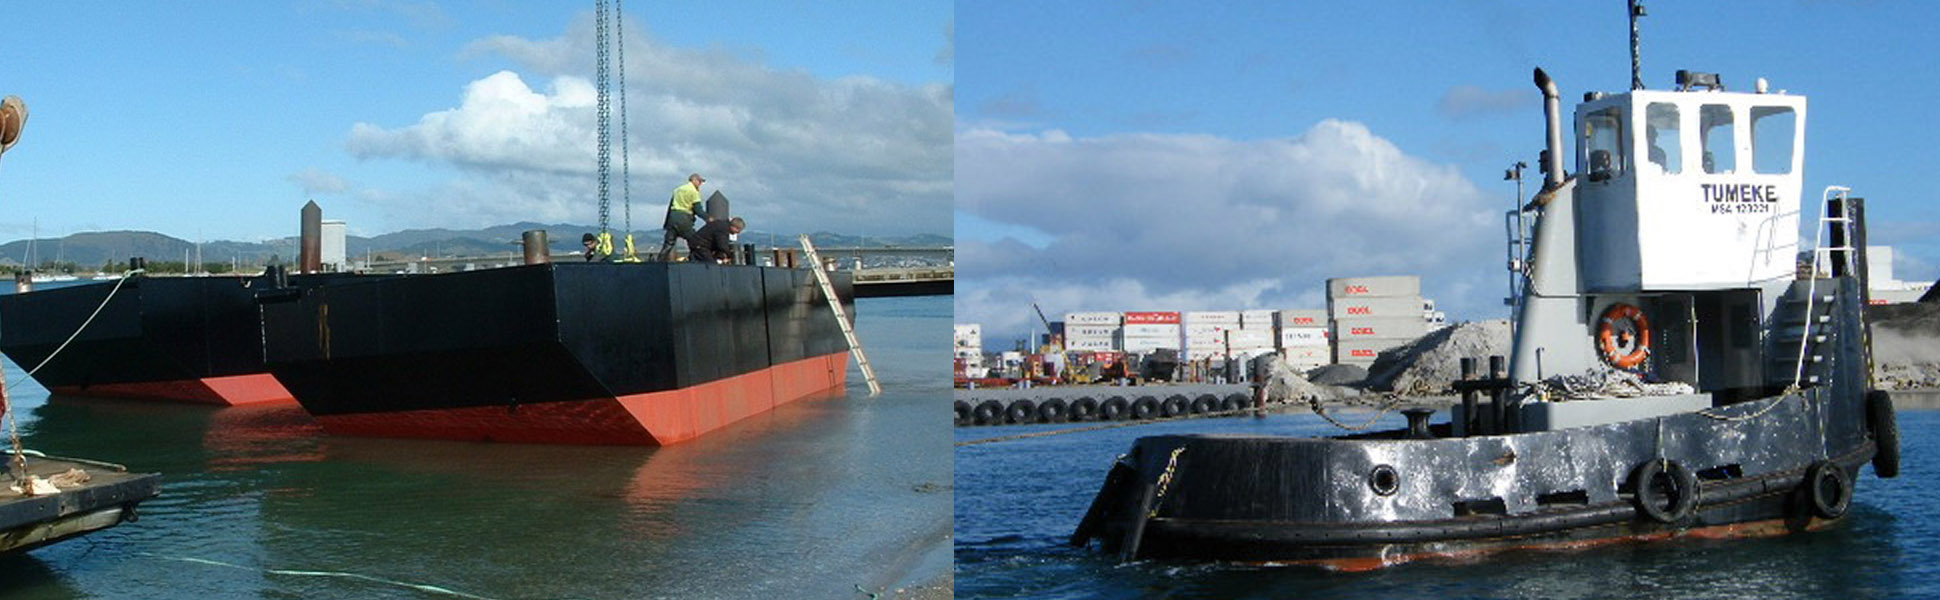 workboats tugs at sea